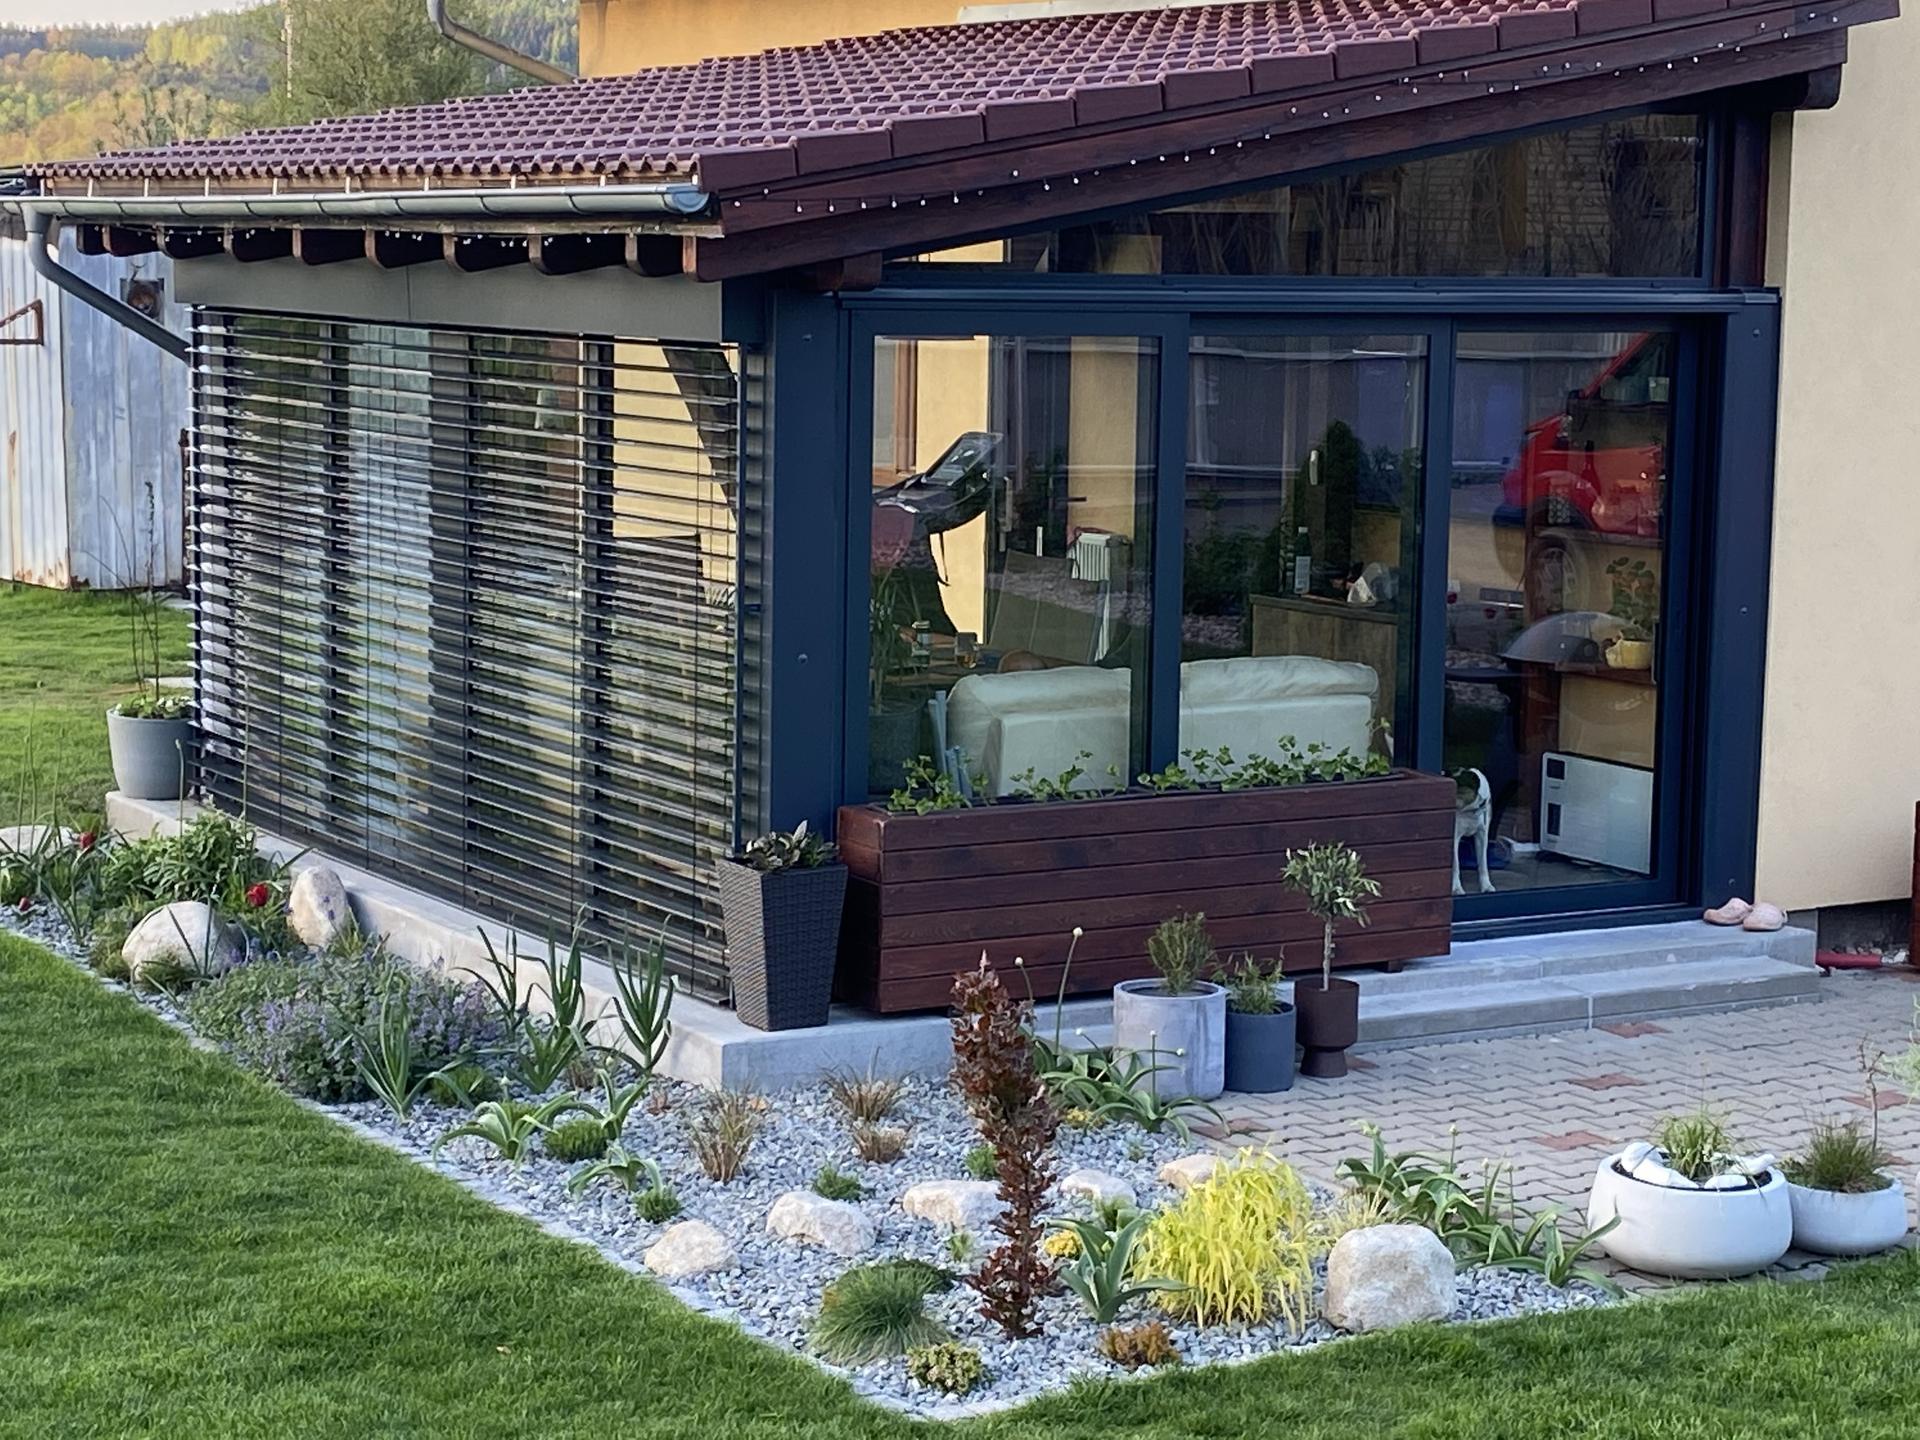 Pergola + zimní zahrada + zahrada - naše zasklená pergola a záhon